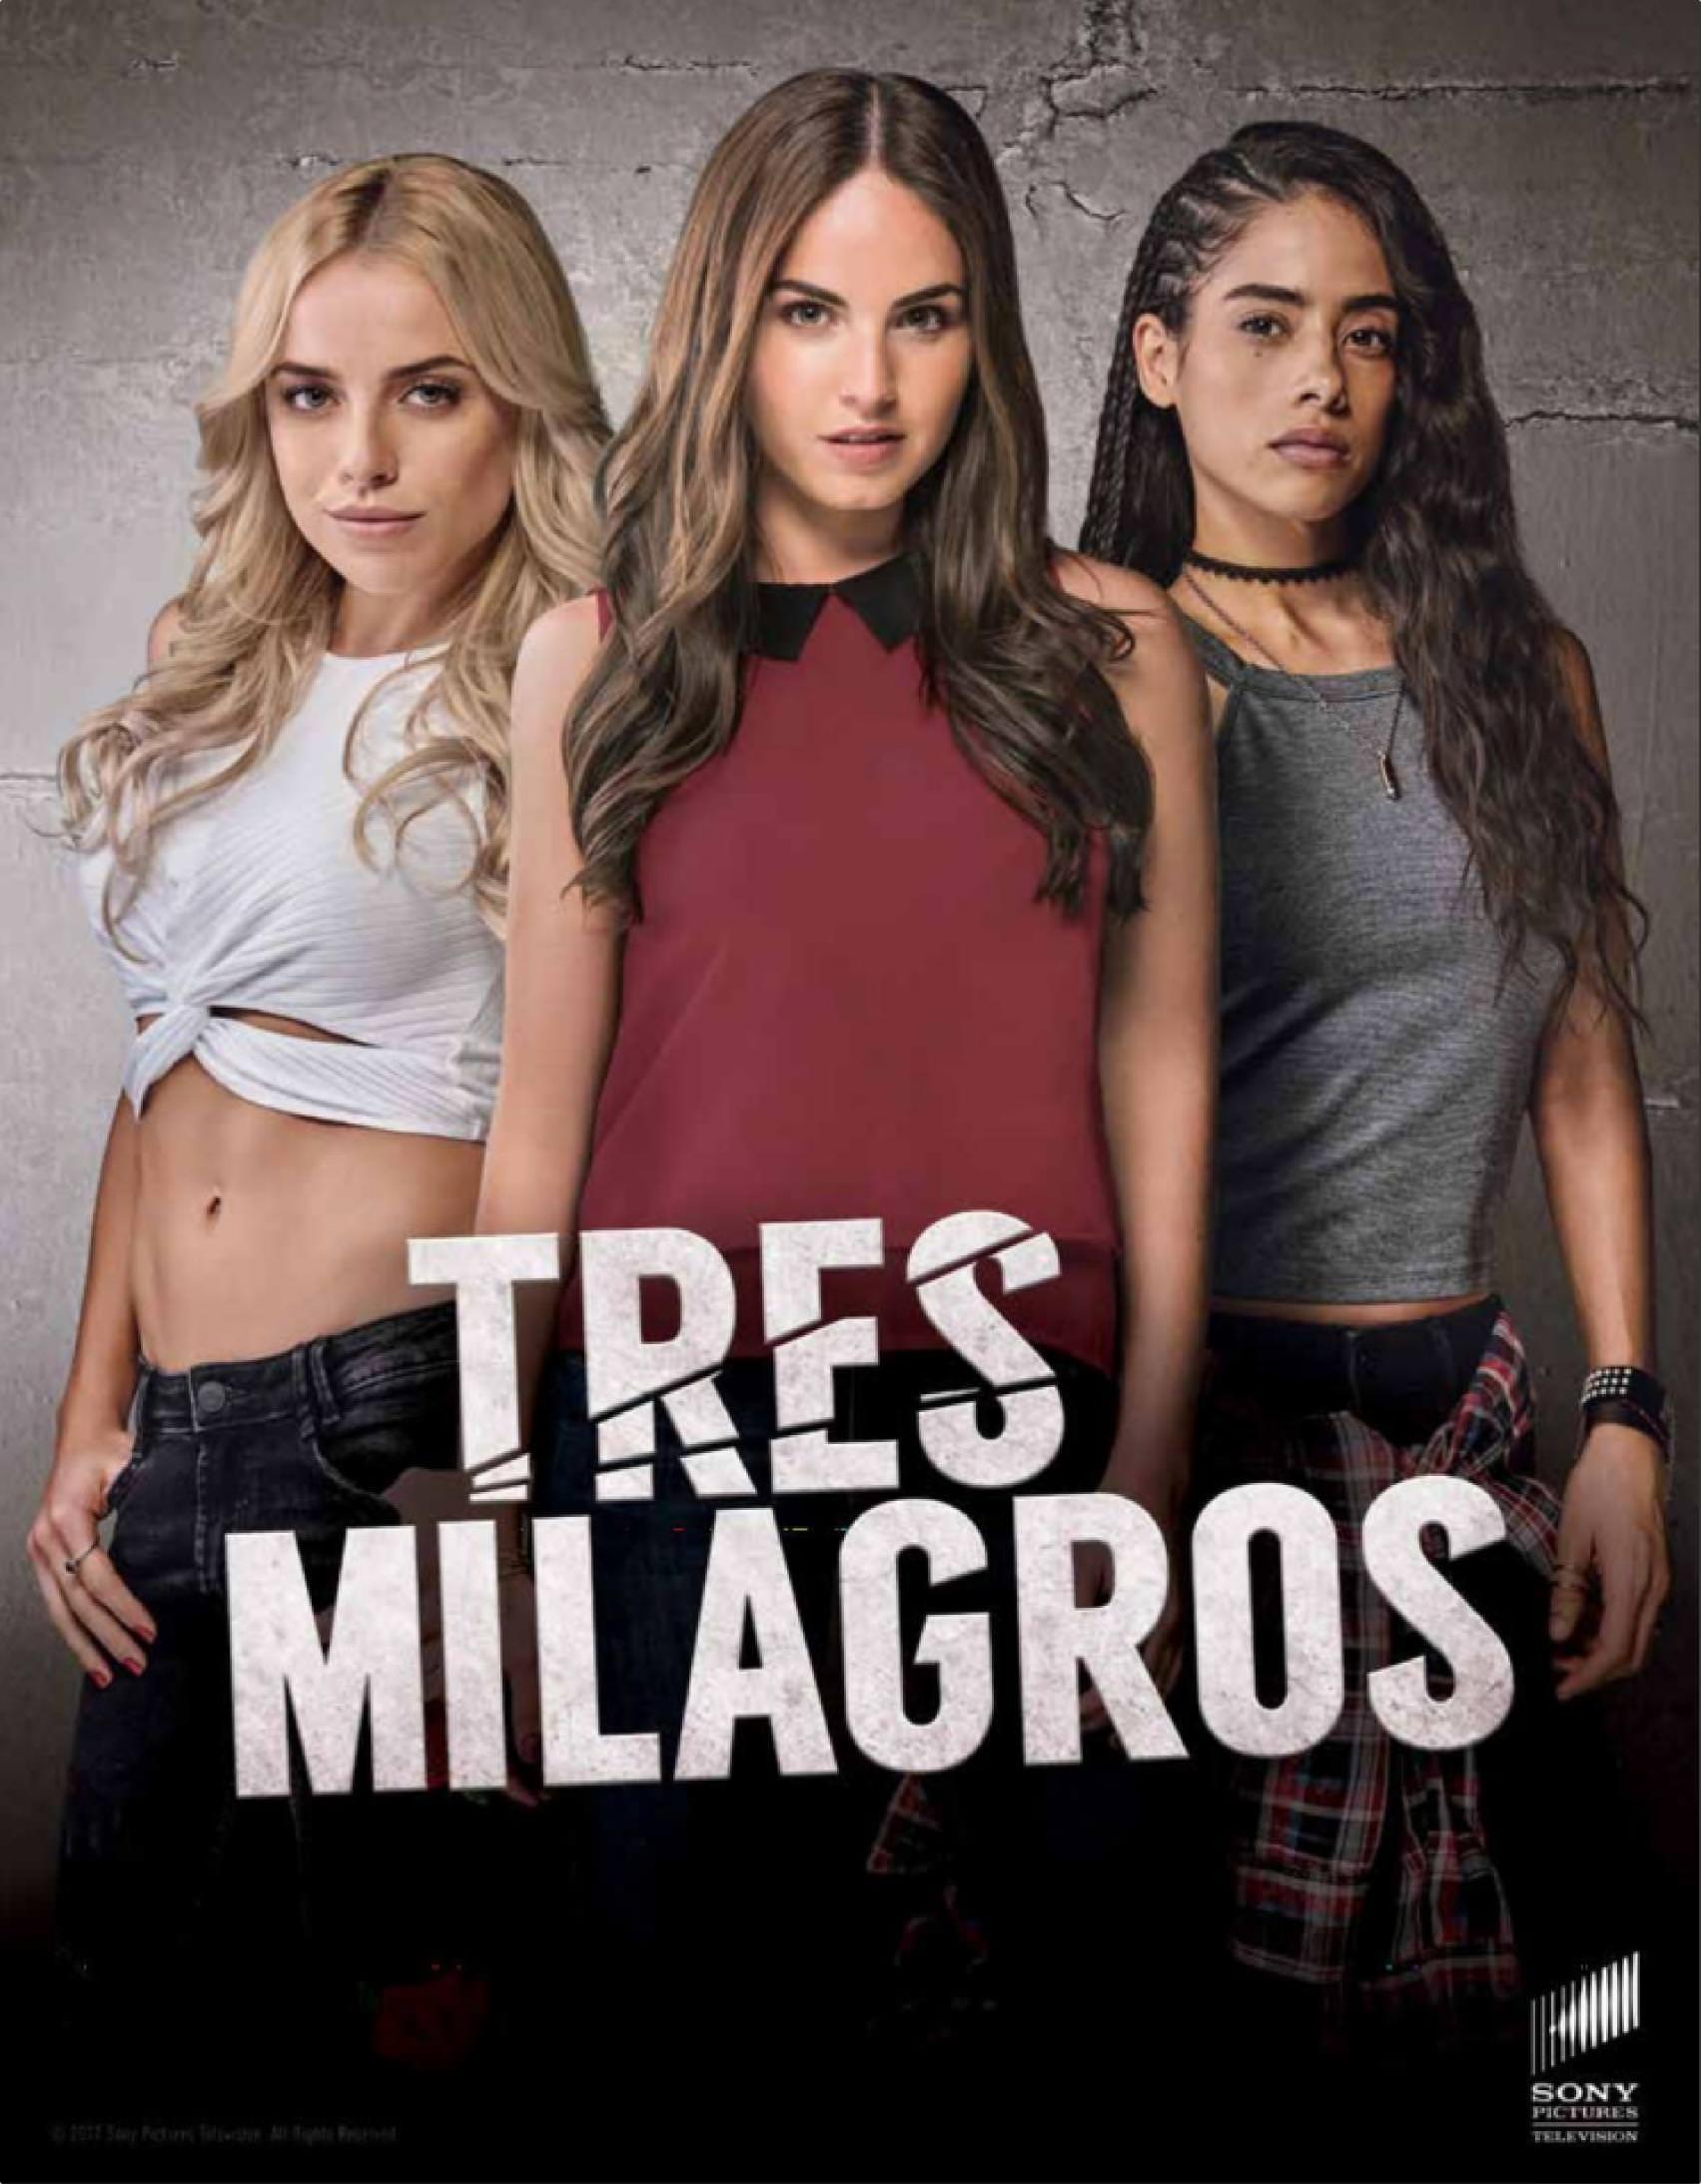 Tres Milagros (2018) | Telenovela Database Wikia | FANDOM